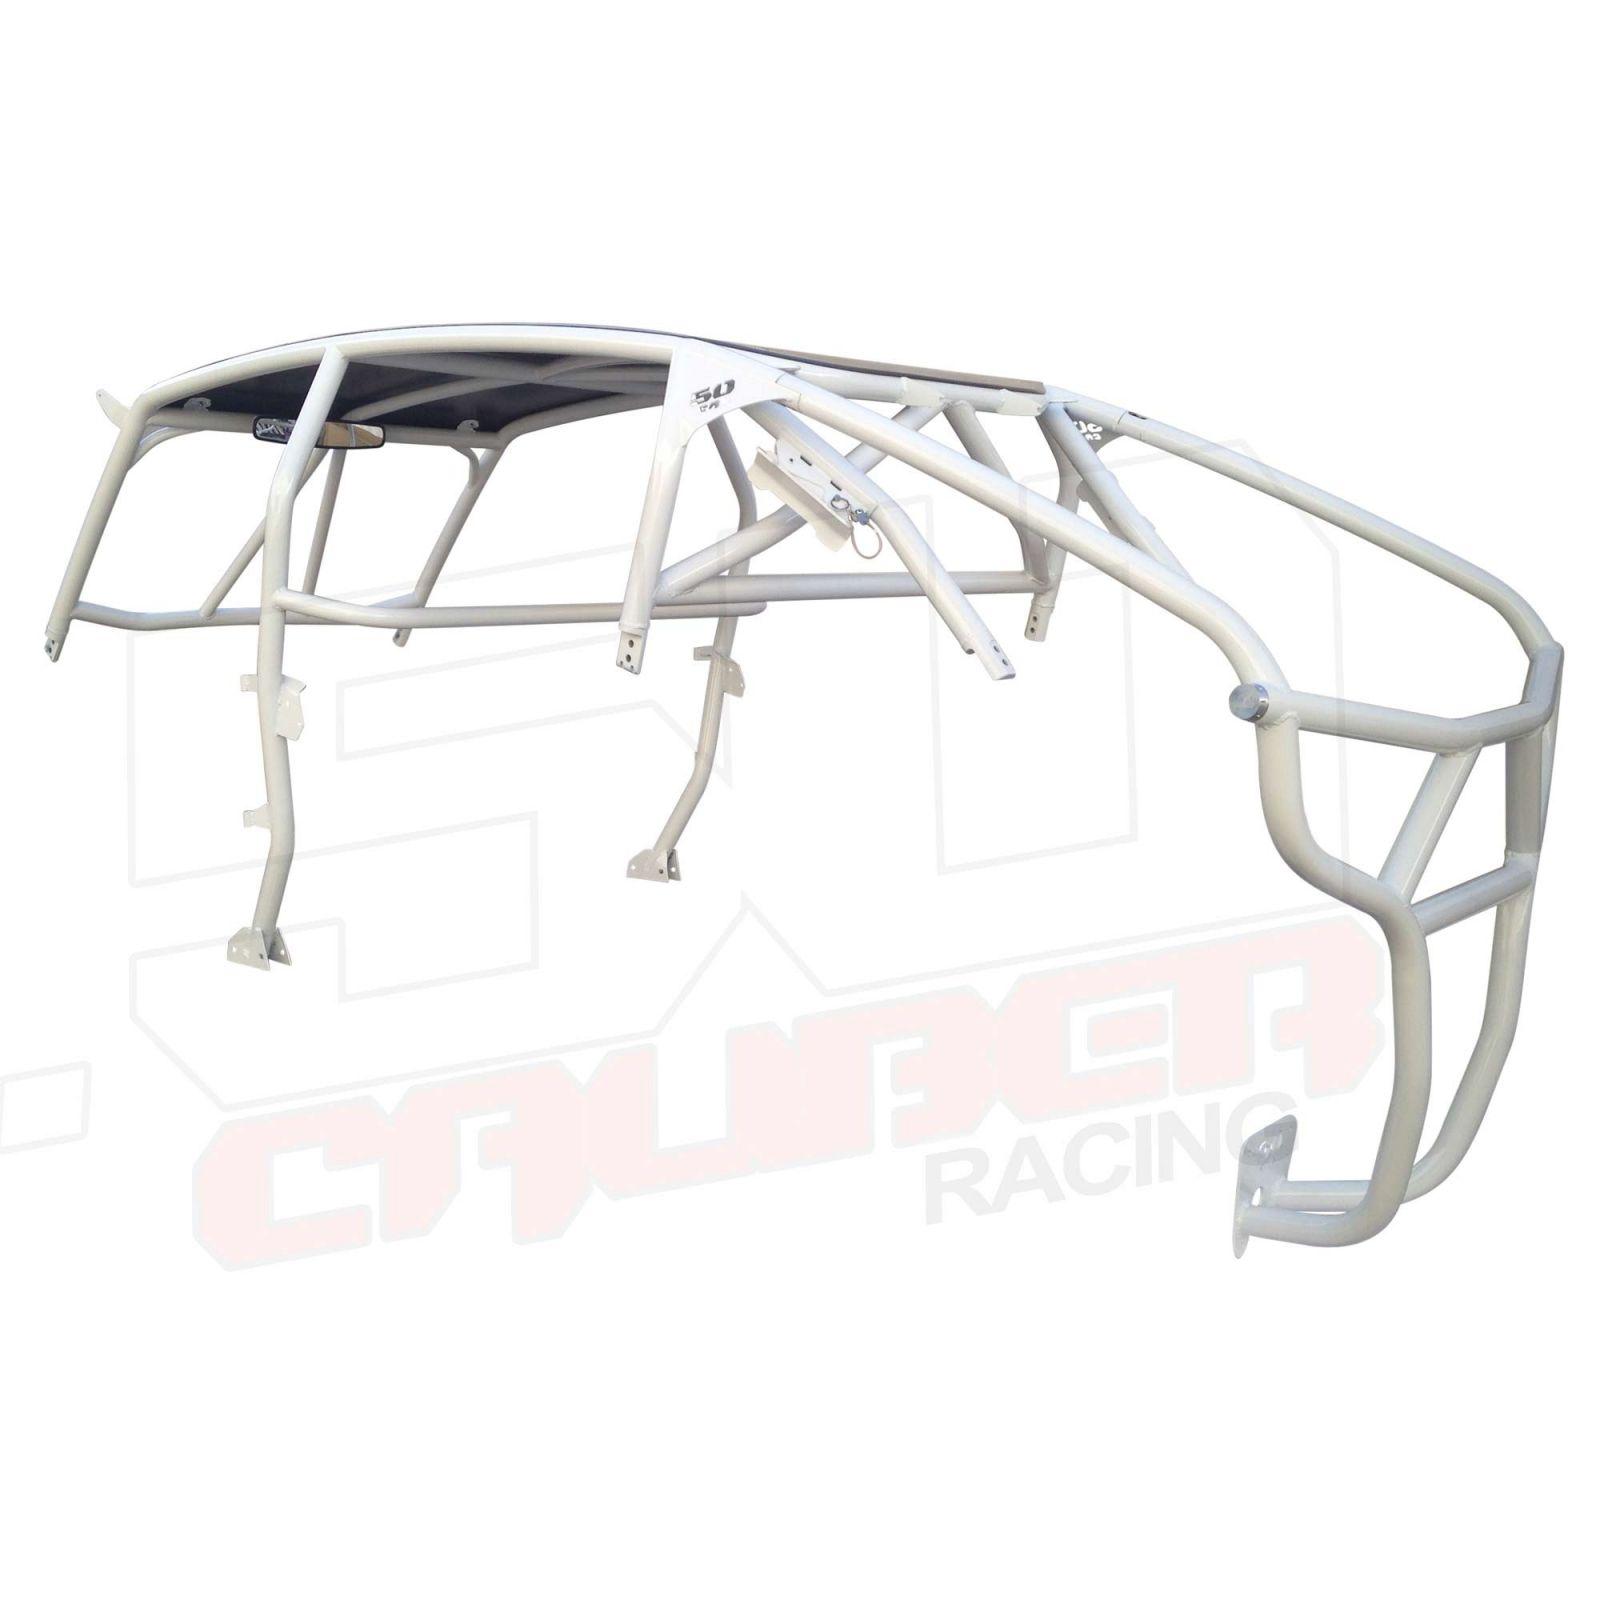 Polaris Rzr Rzr4 Xp Turbo Roll Cage Radius Bends Aluminum Roof Usa